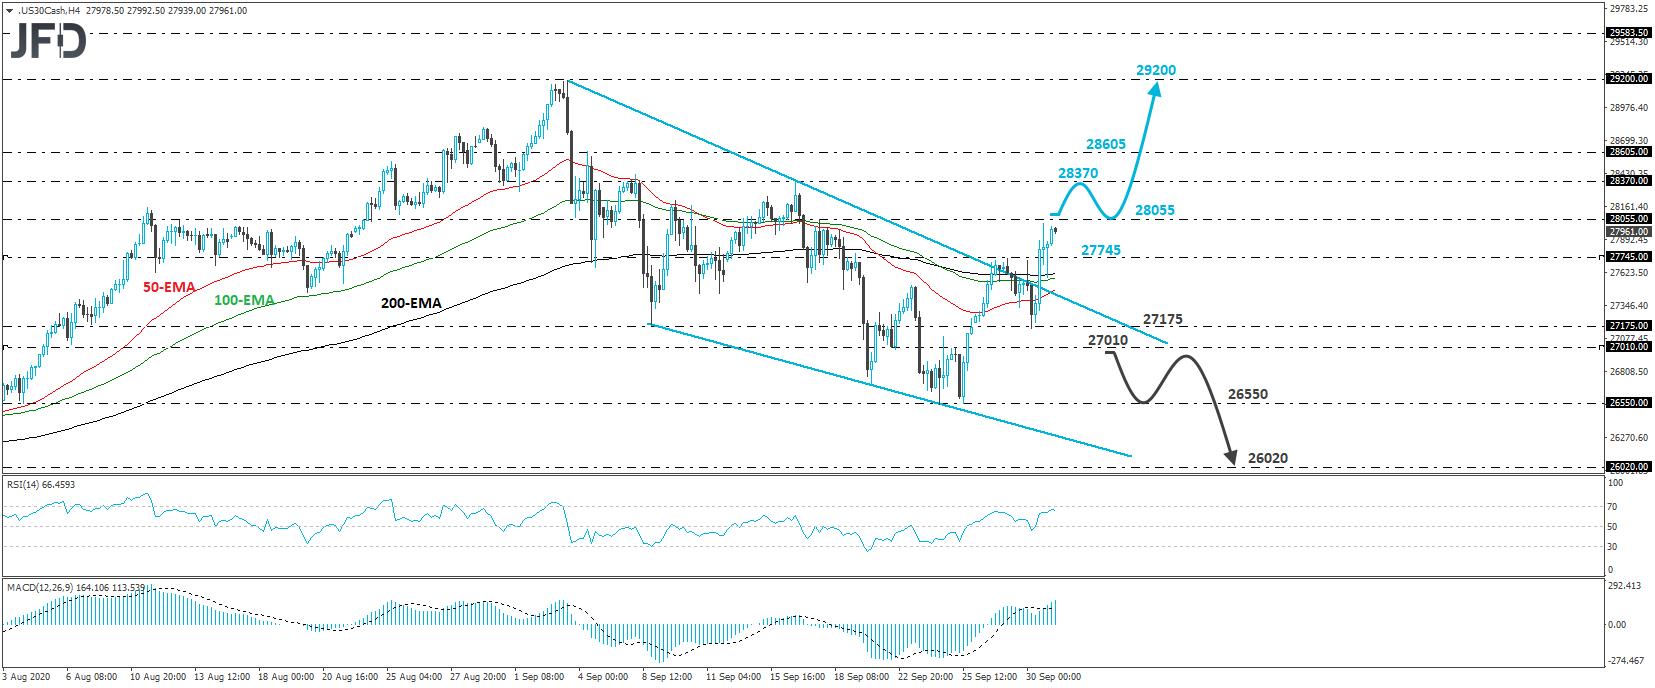 Dow Jones Industrial Average 4-hour chart technical analysis